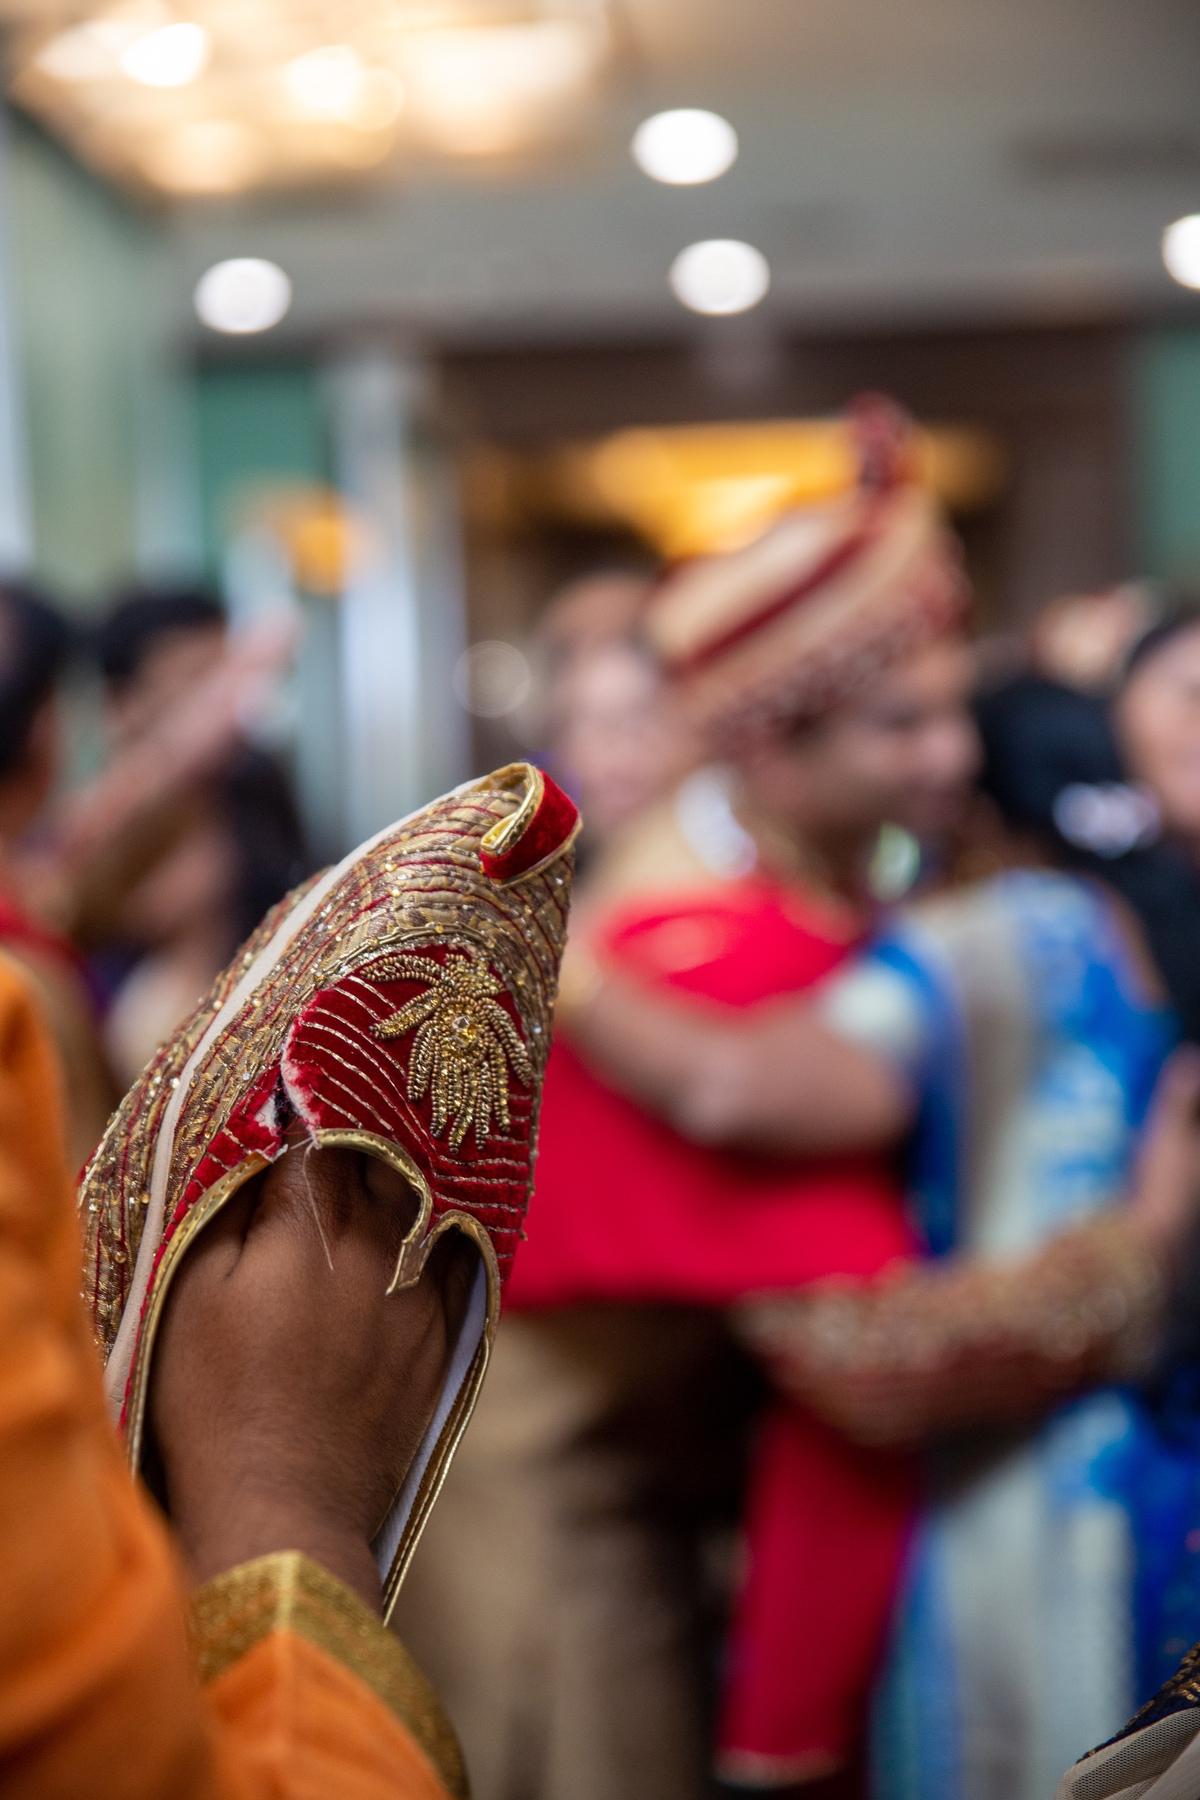 Le Cape Weddings - South Asian Wedding - Chicago Wedding Photographer P&V-70.jpg